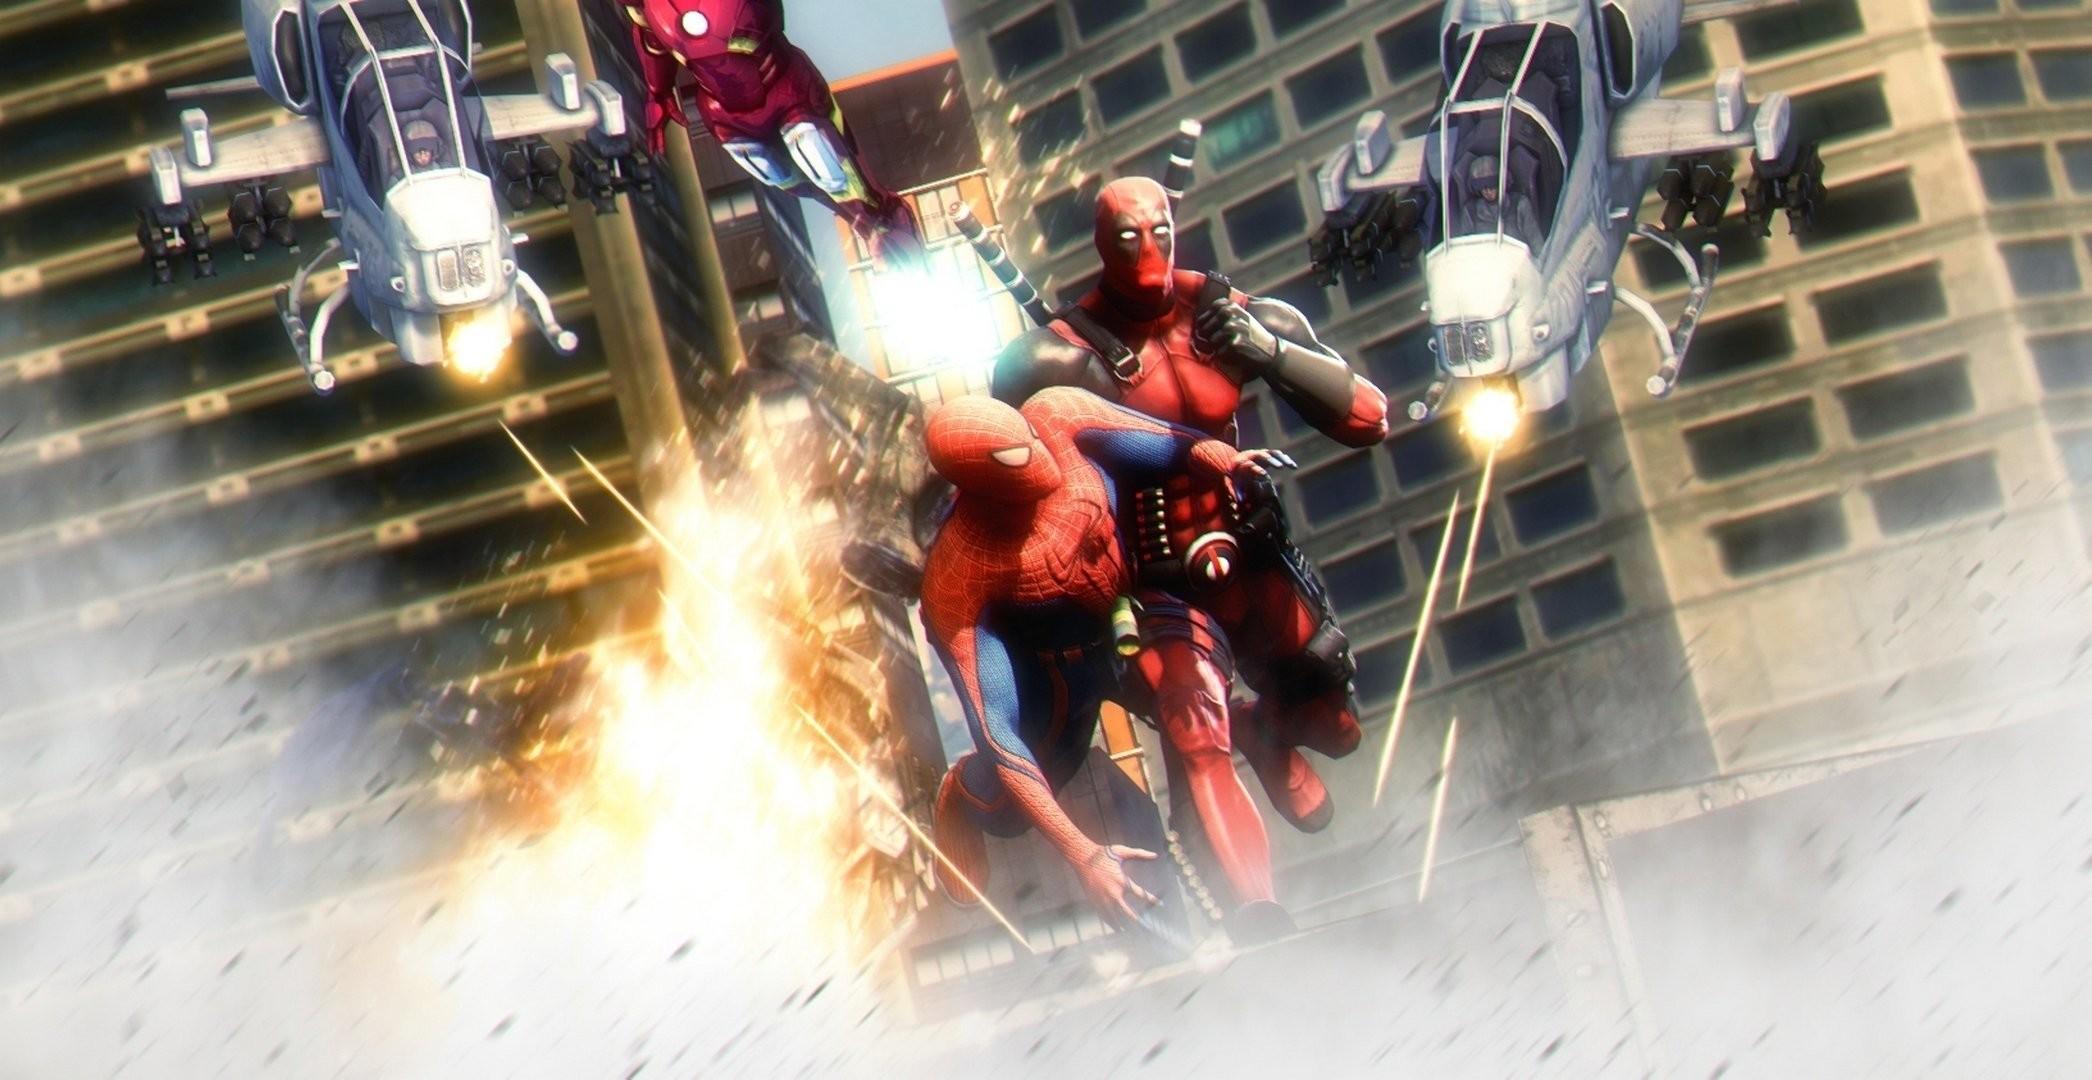 Heroes comics Deadpool hero Battles Spiderman Fantasy wallpaper      356228   WallpaperUP